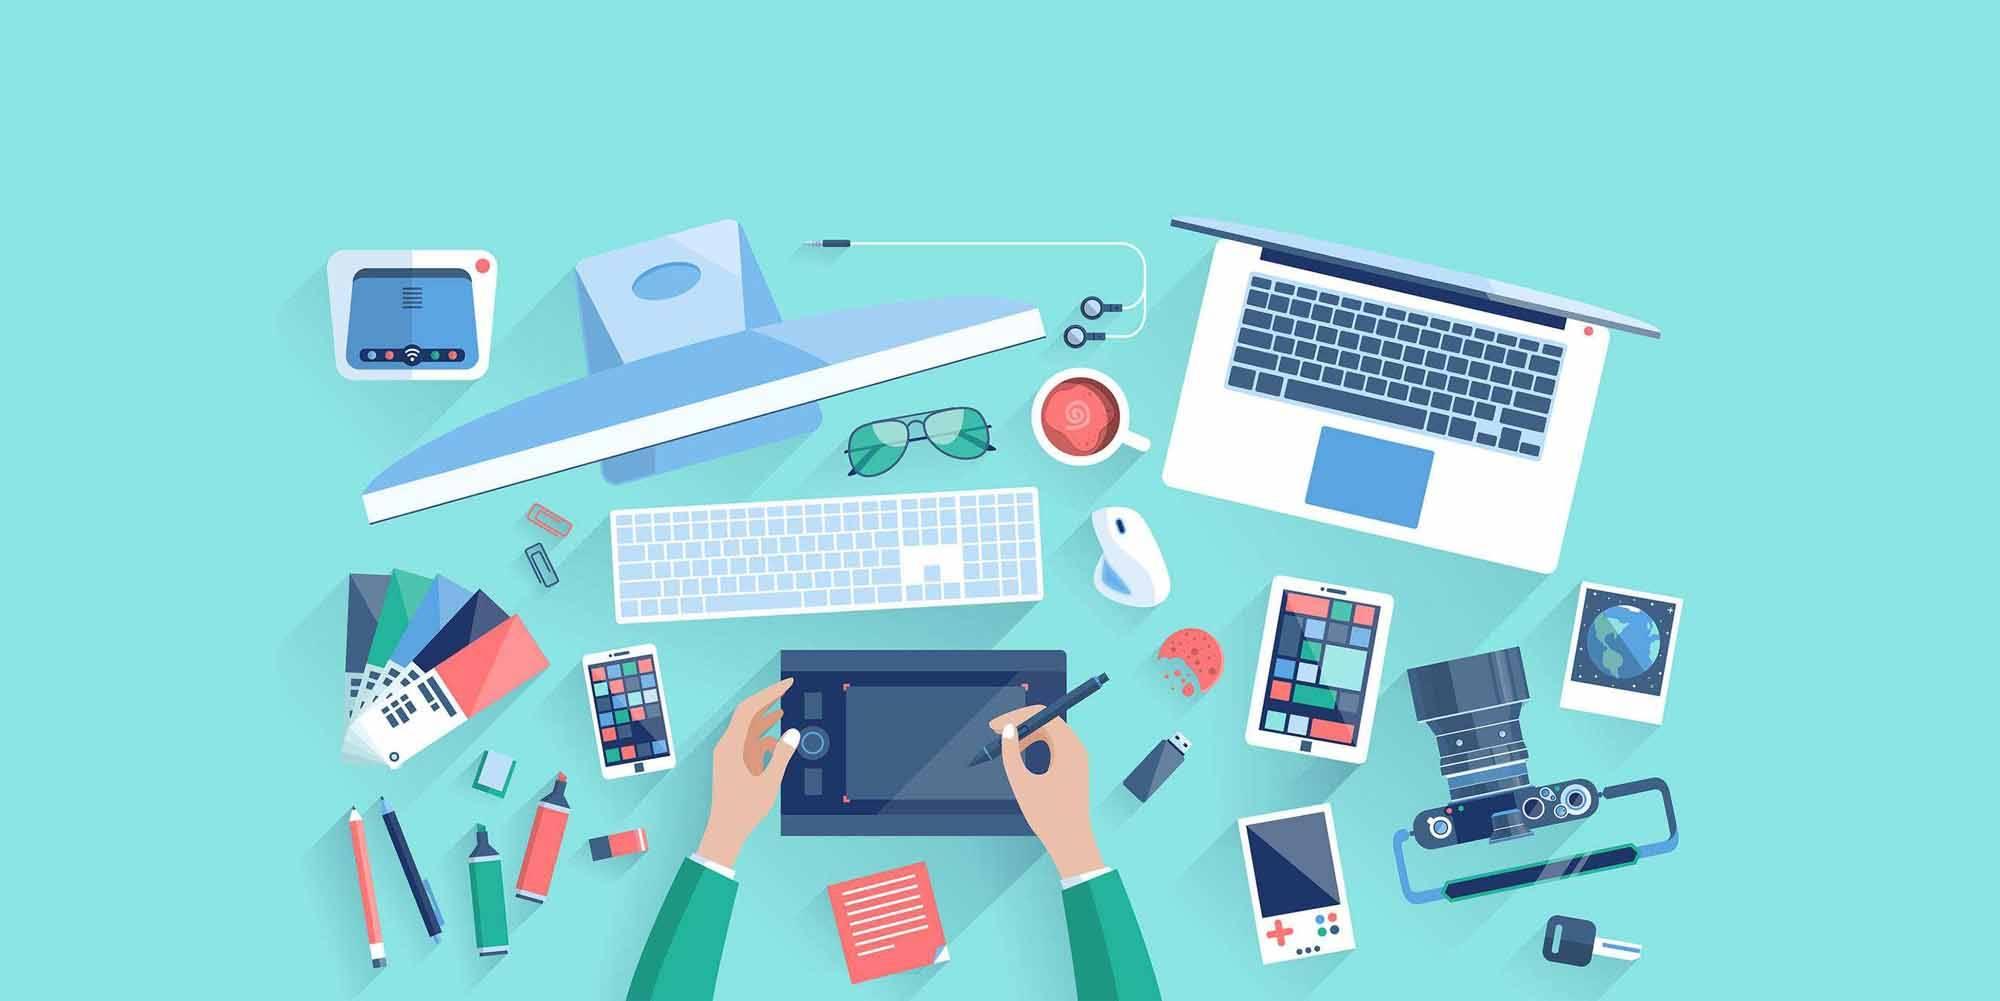 Website Design Tips - 20 Things Your Website Needs